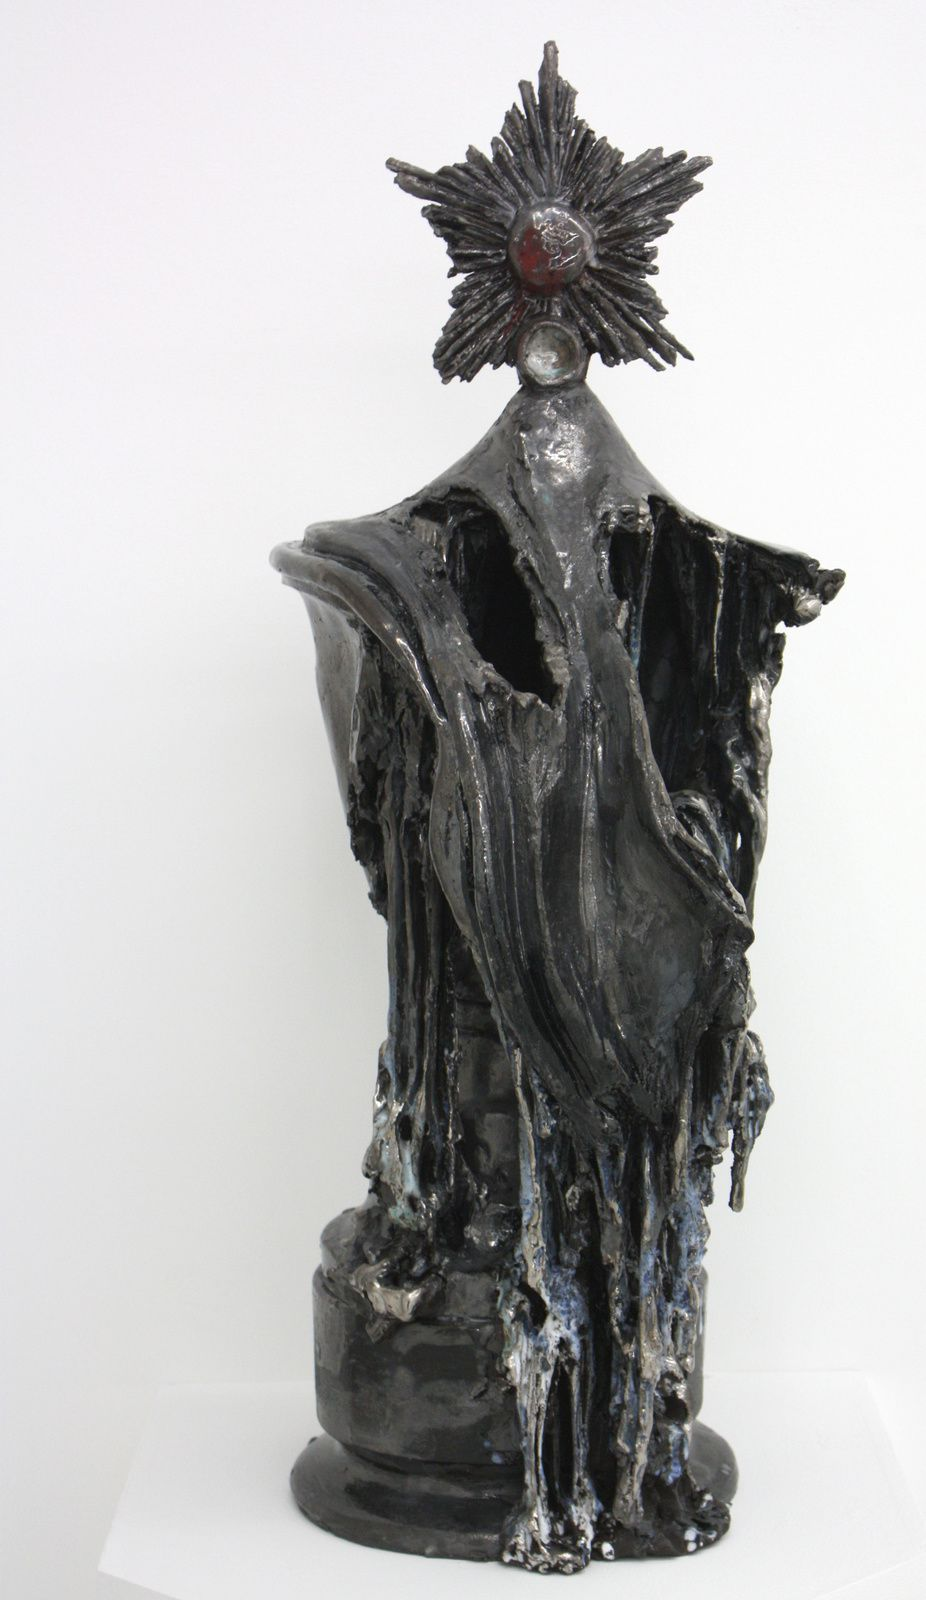 expo sculpture contemporaine anne wenzel radical delight actuart by eric simon. Black Bedroom Furniture Sets. Home Design Ideas